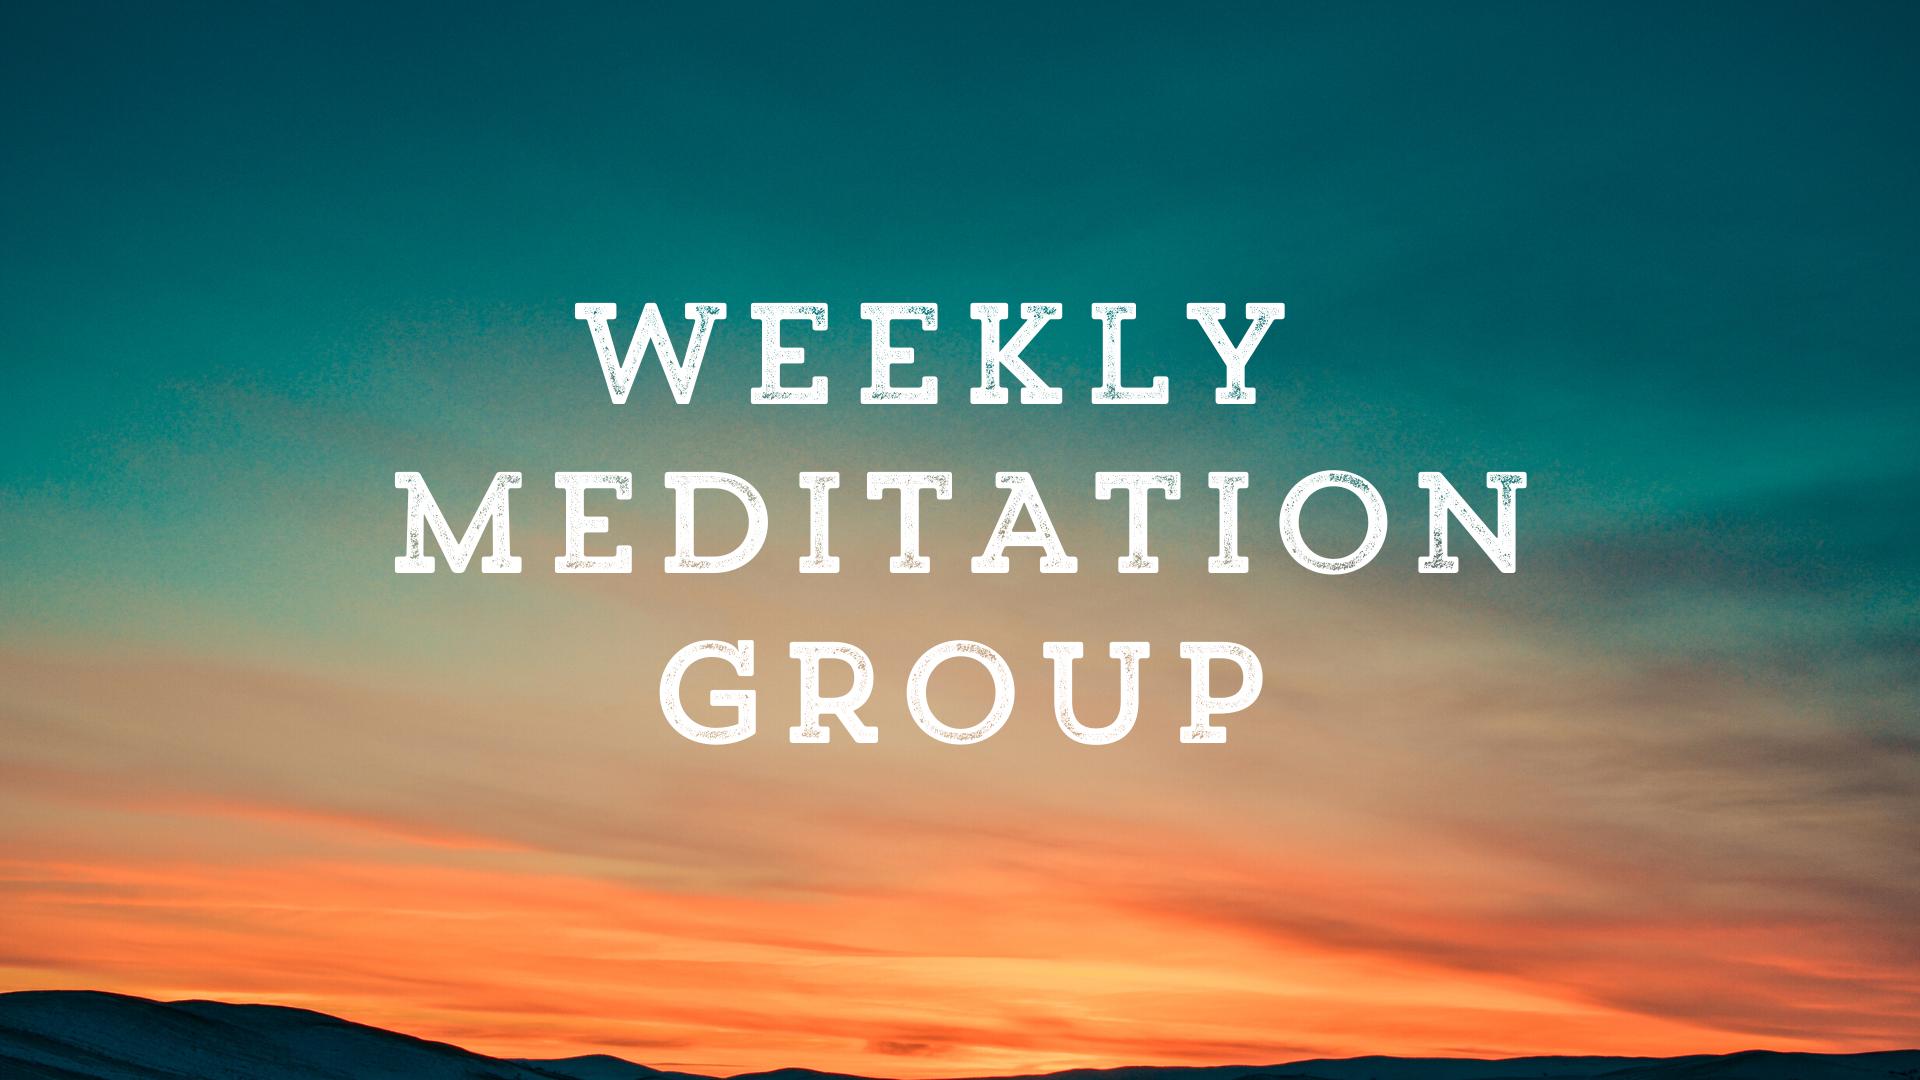 Weekly Meditation Group